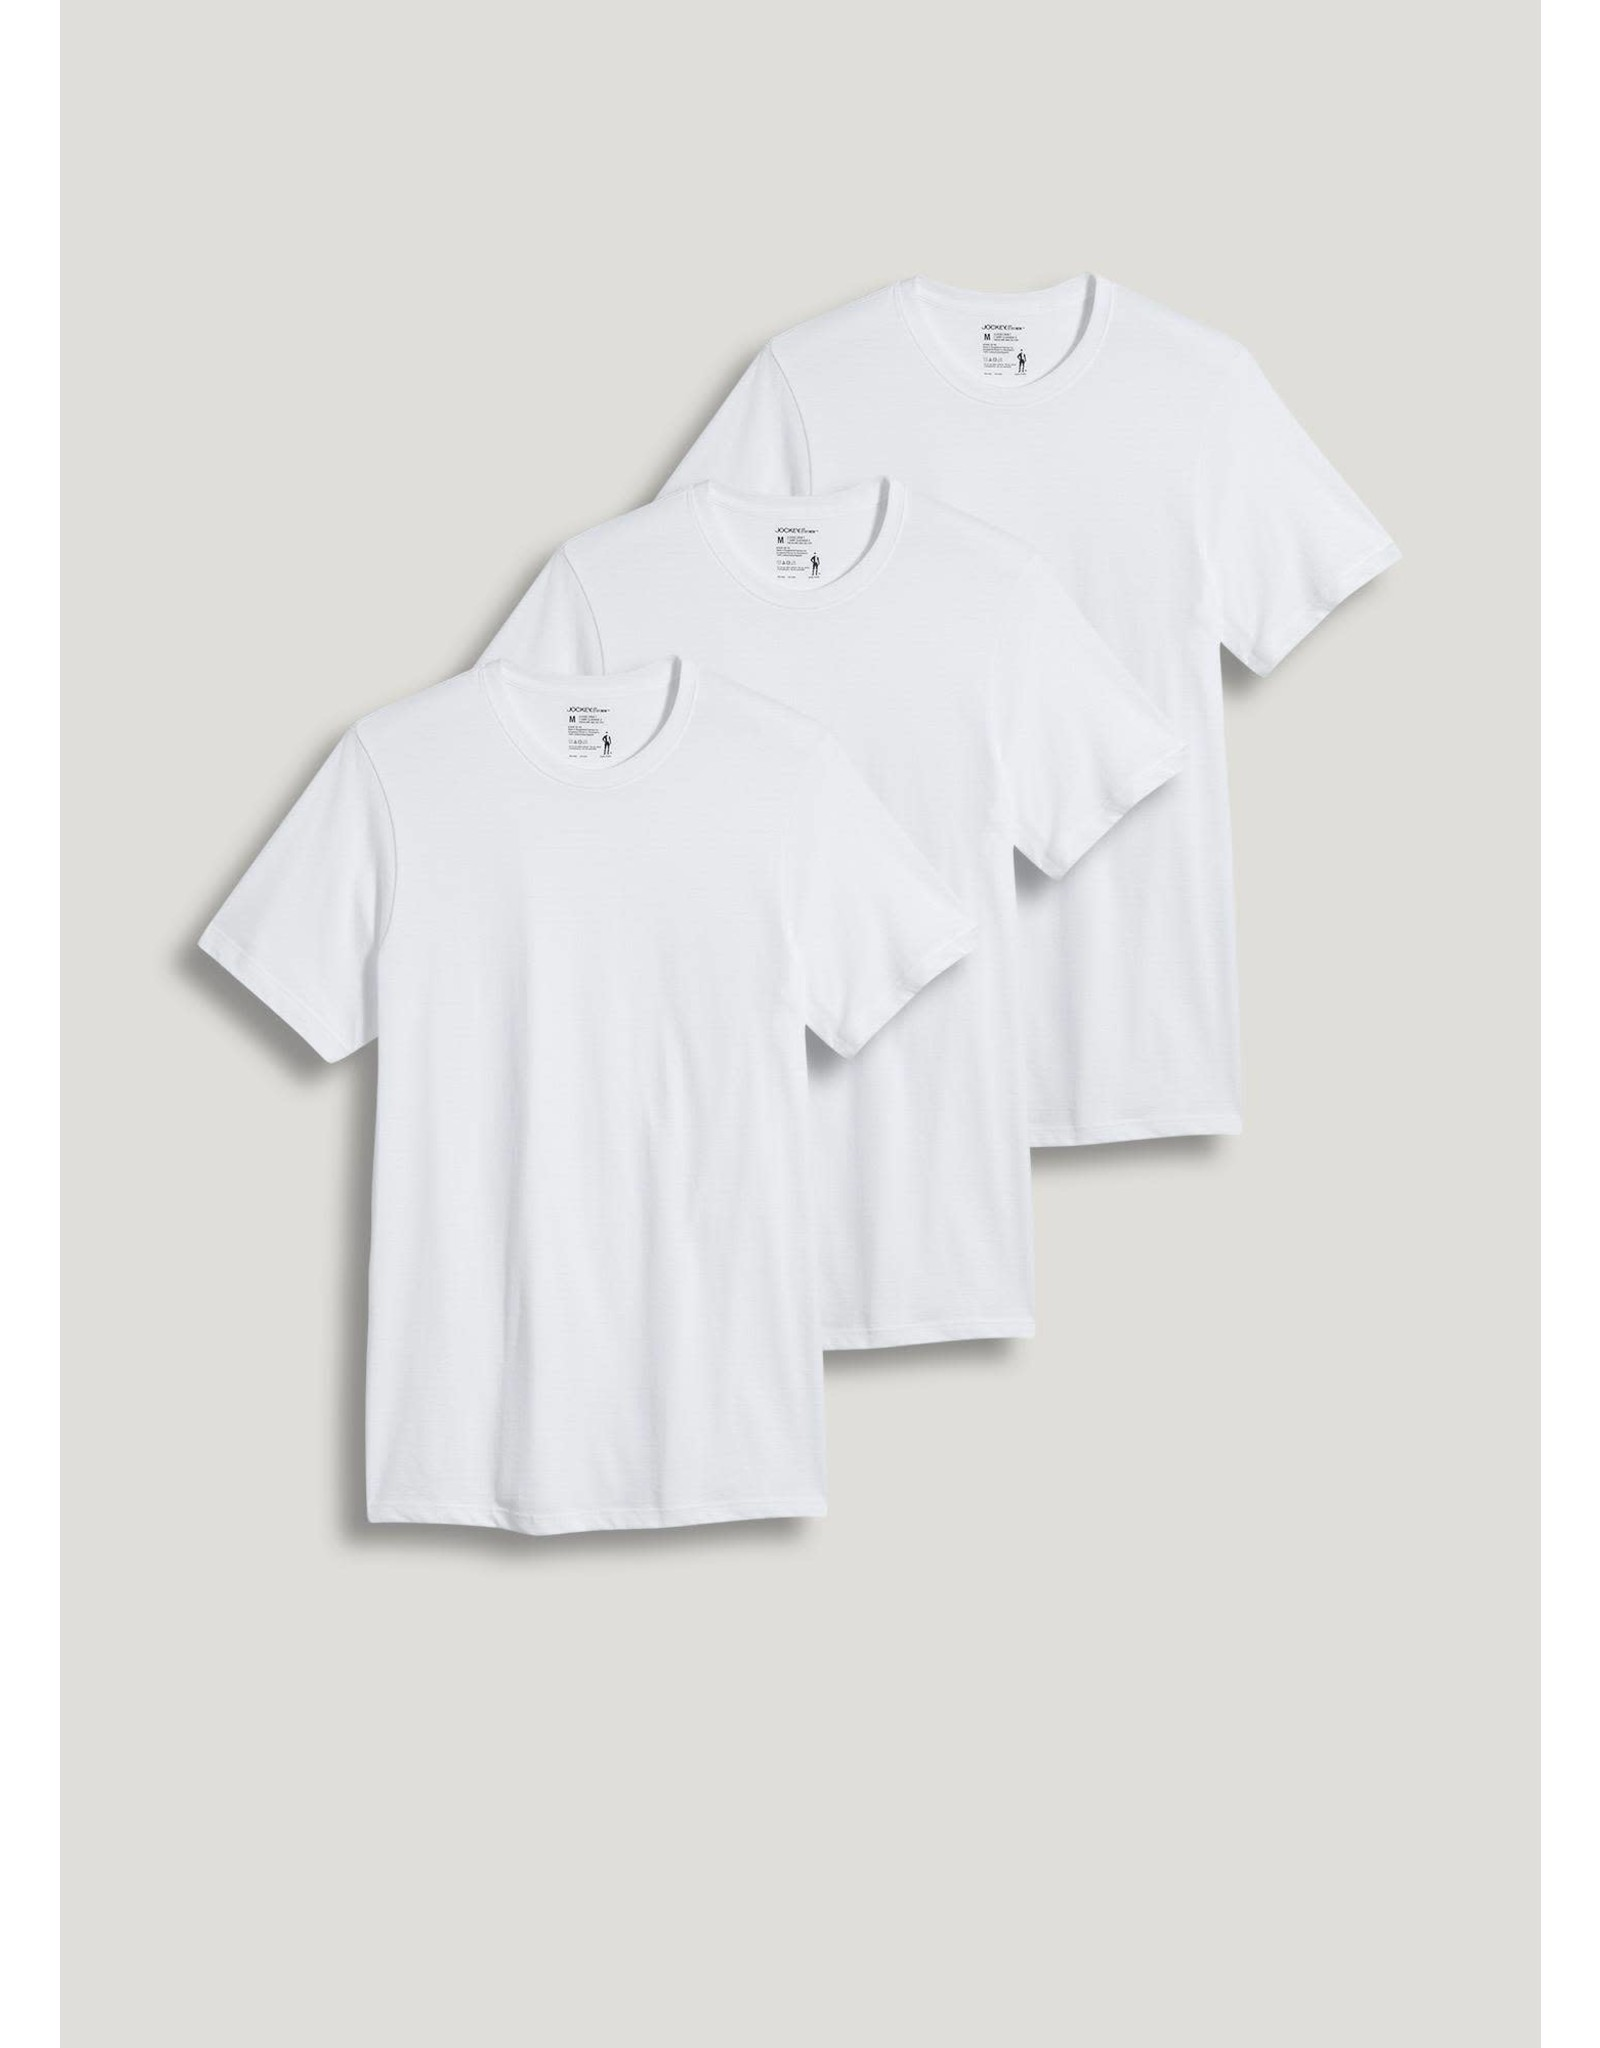 JOCKEY Classic Knits 100% Cotton T-Shirts, Crew Neck (3 Pack)